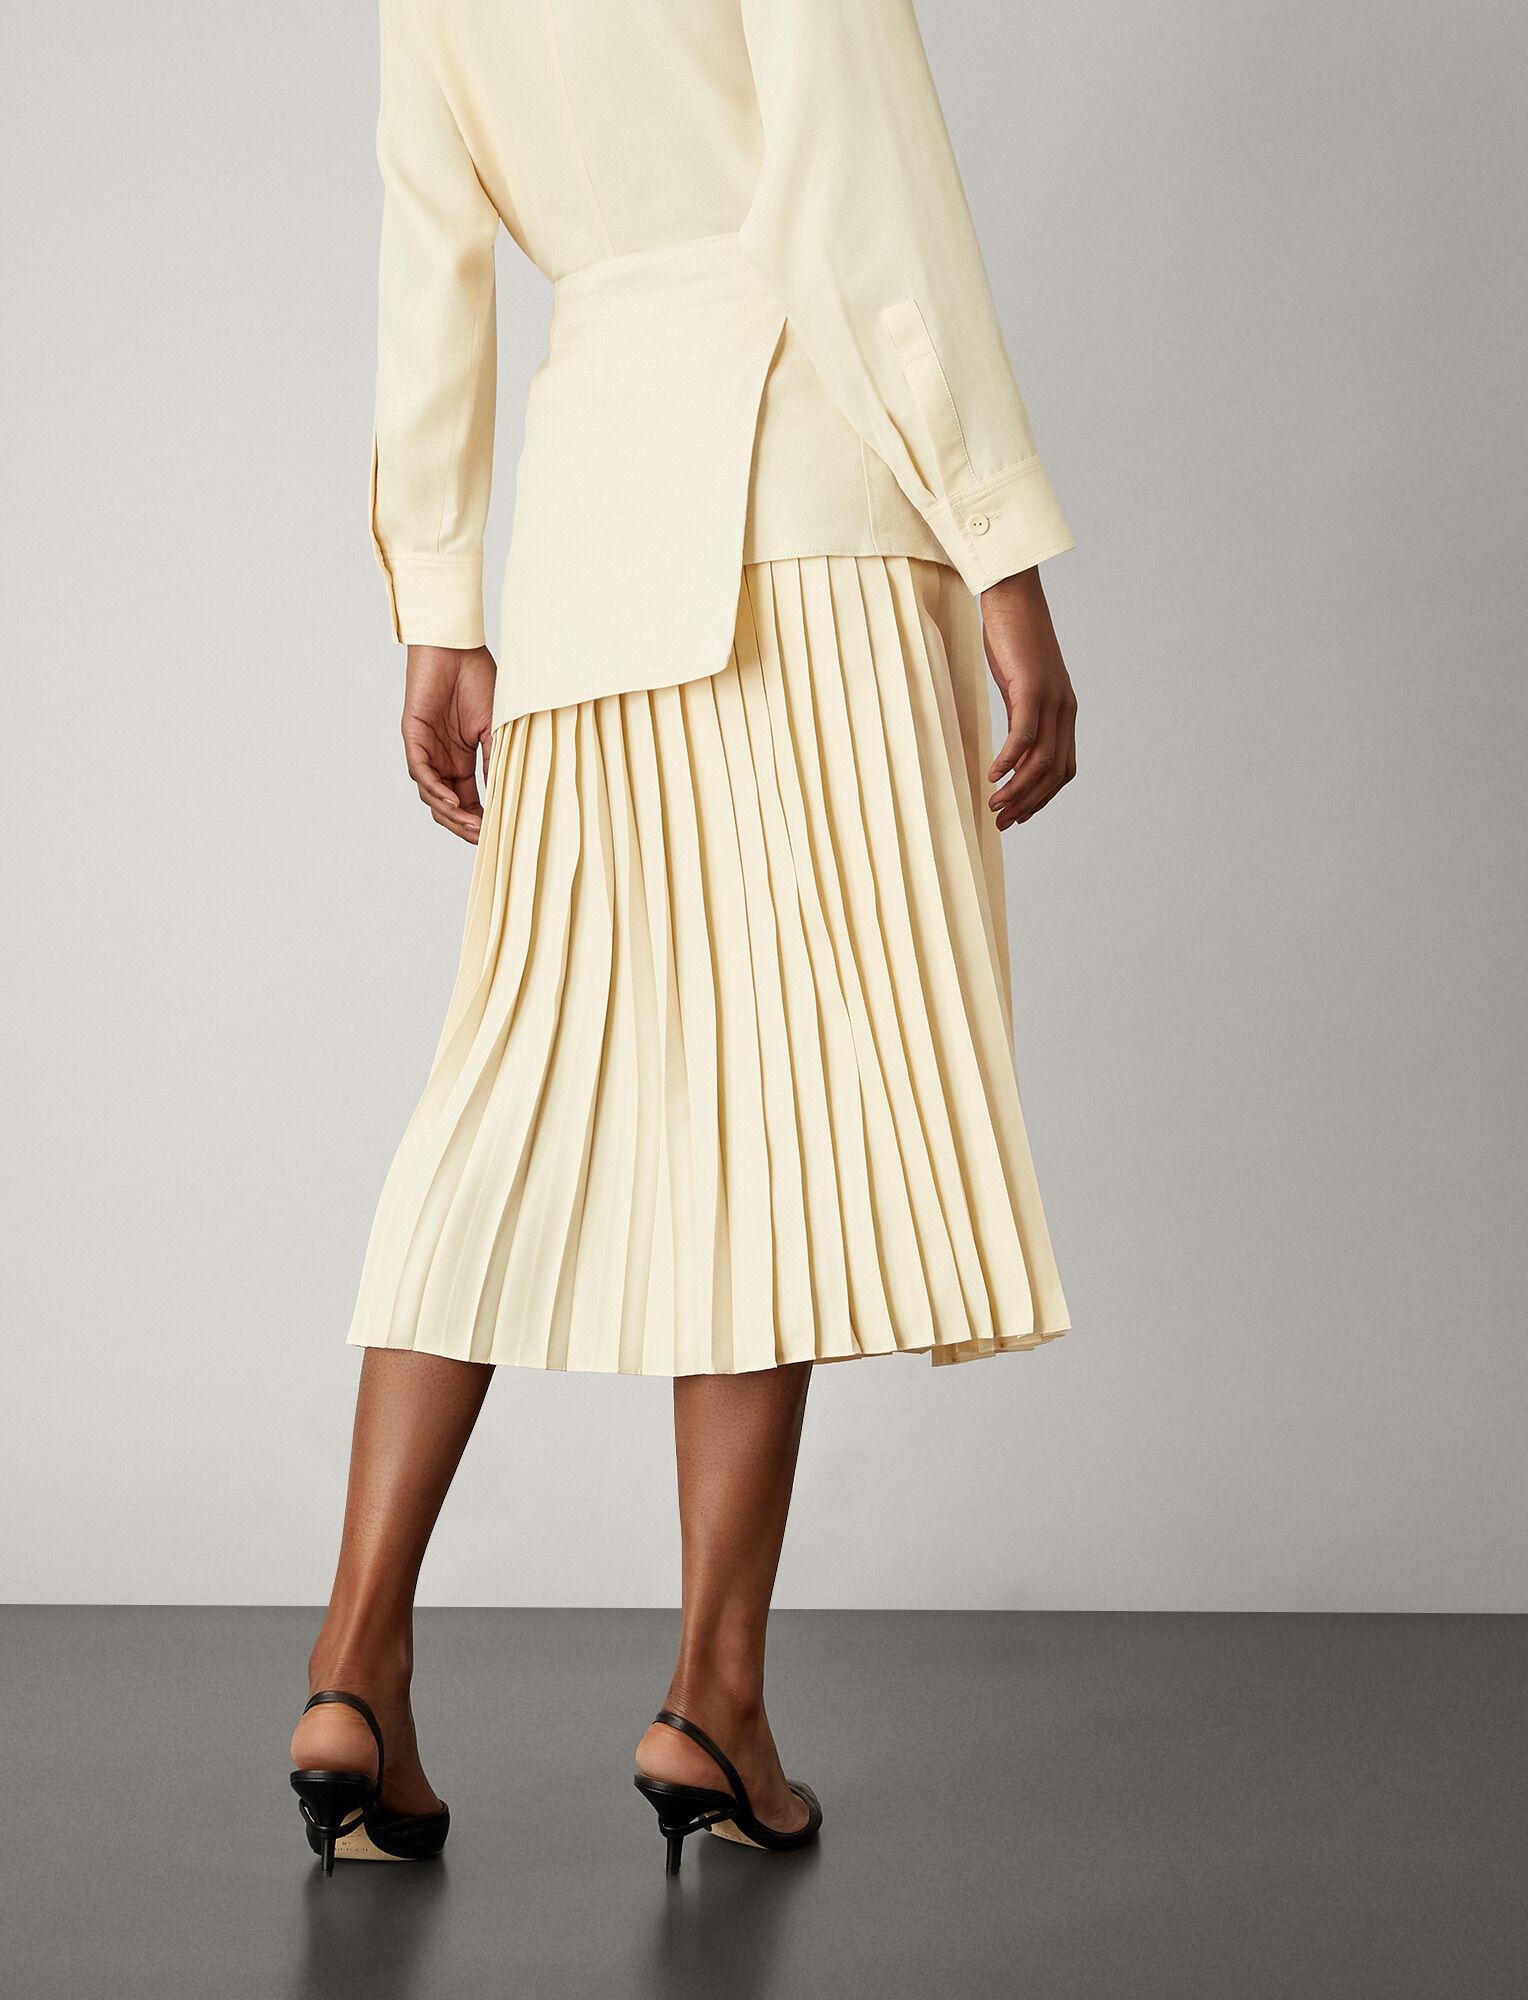 Joseph, Billie Boucle Fuji Silk Skirt, in BONE